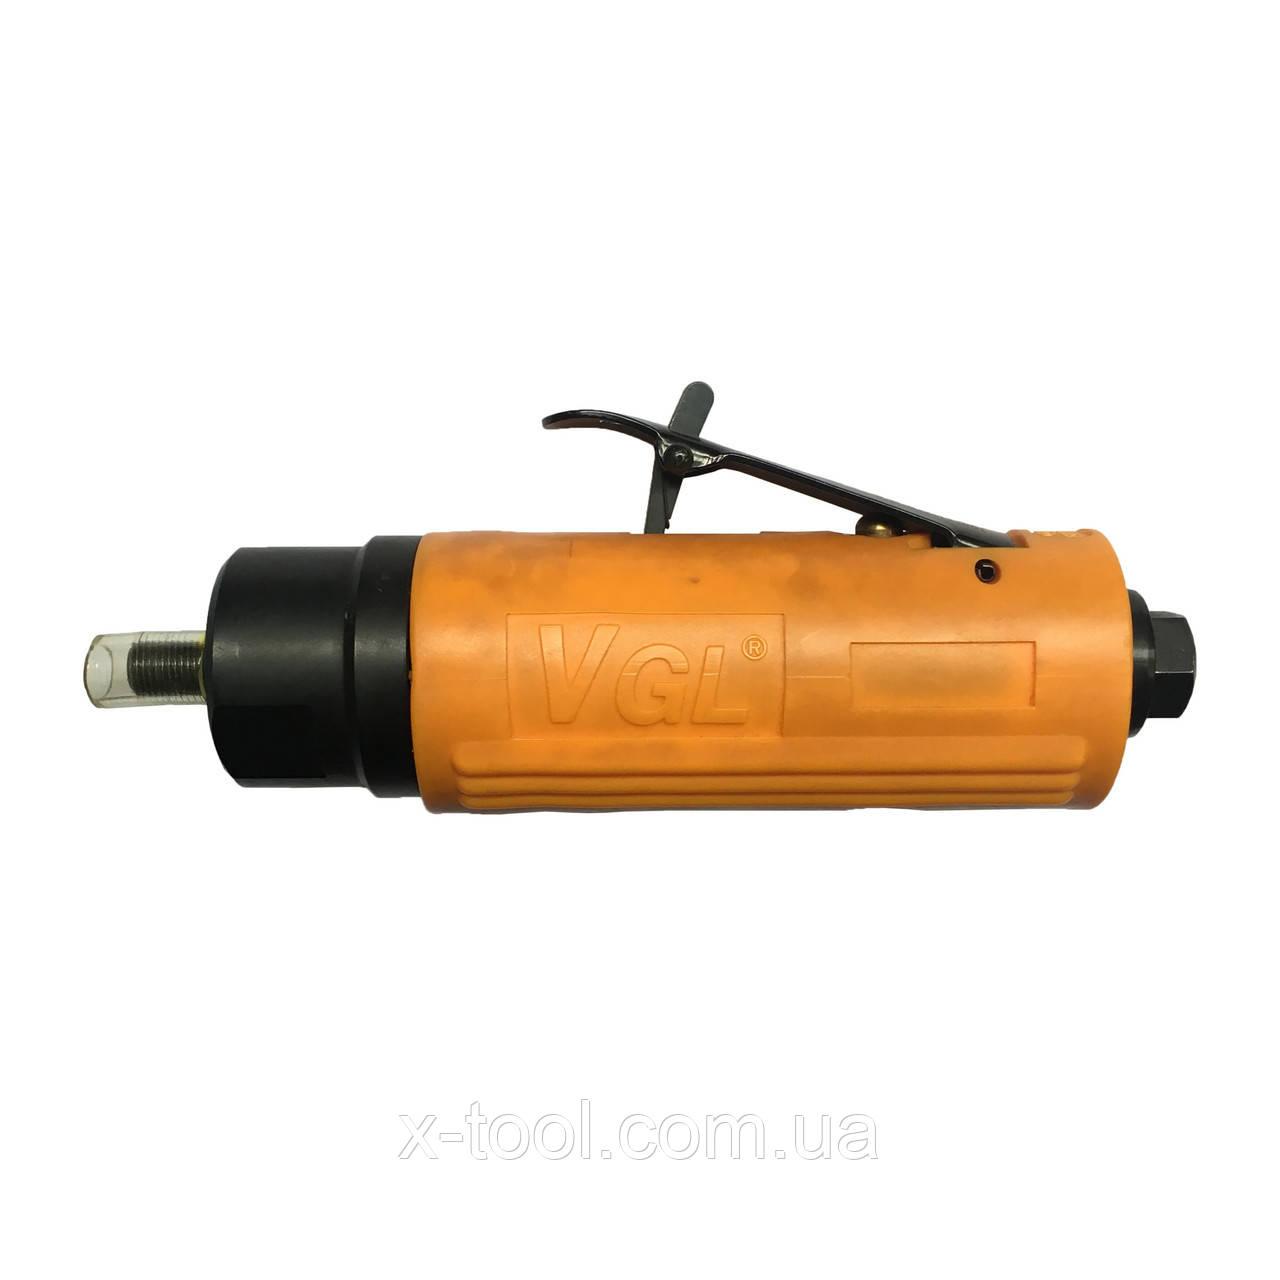 Гриндер прямой пневматический для шин VGL SA8714P (Тайвань)